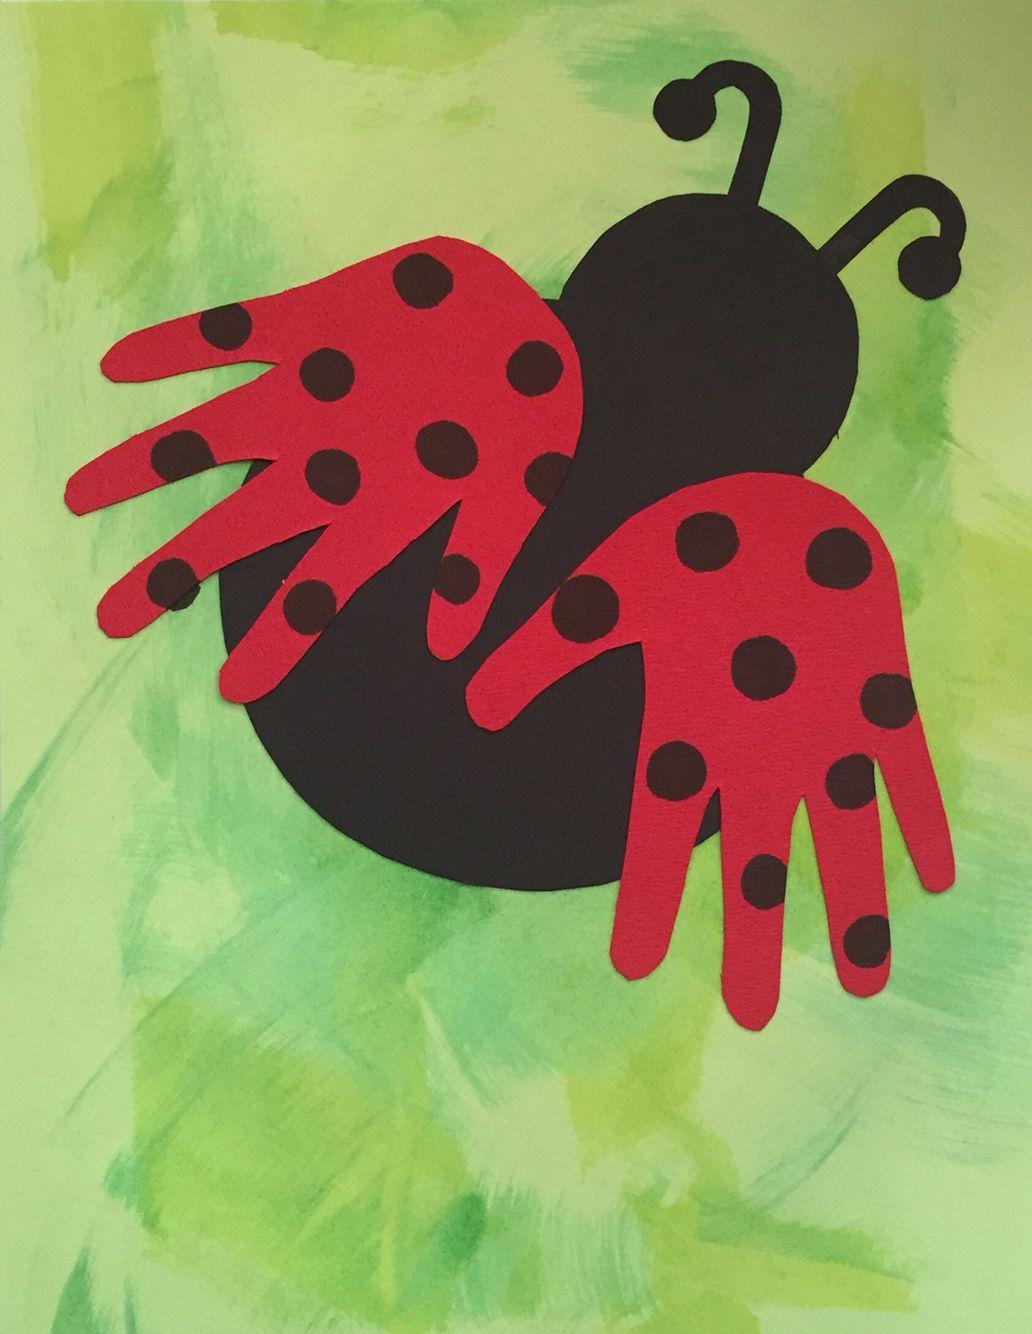 Ladybug Handprints For Cover Of Preschool Memory Books